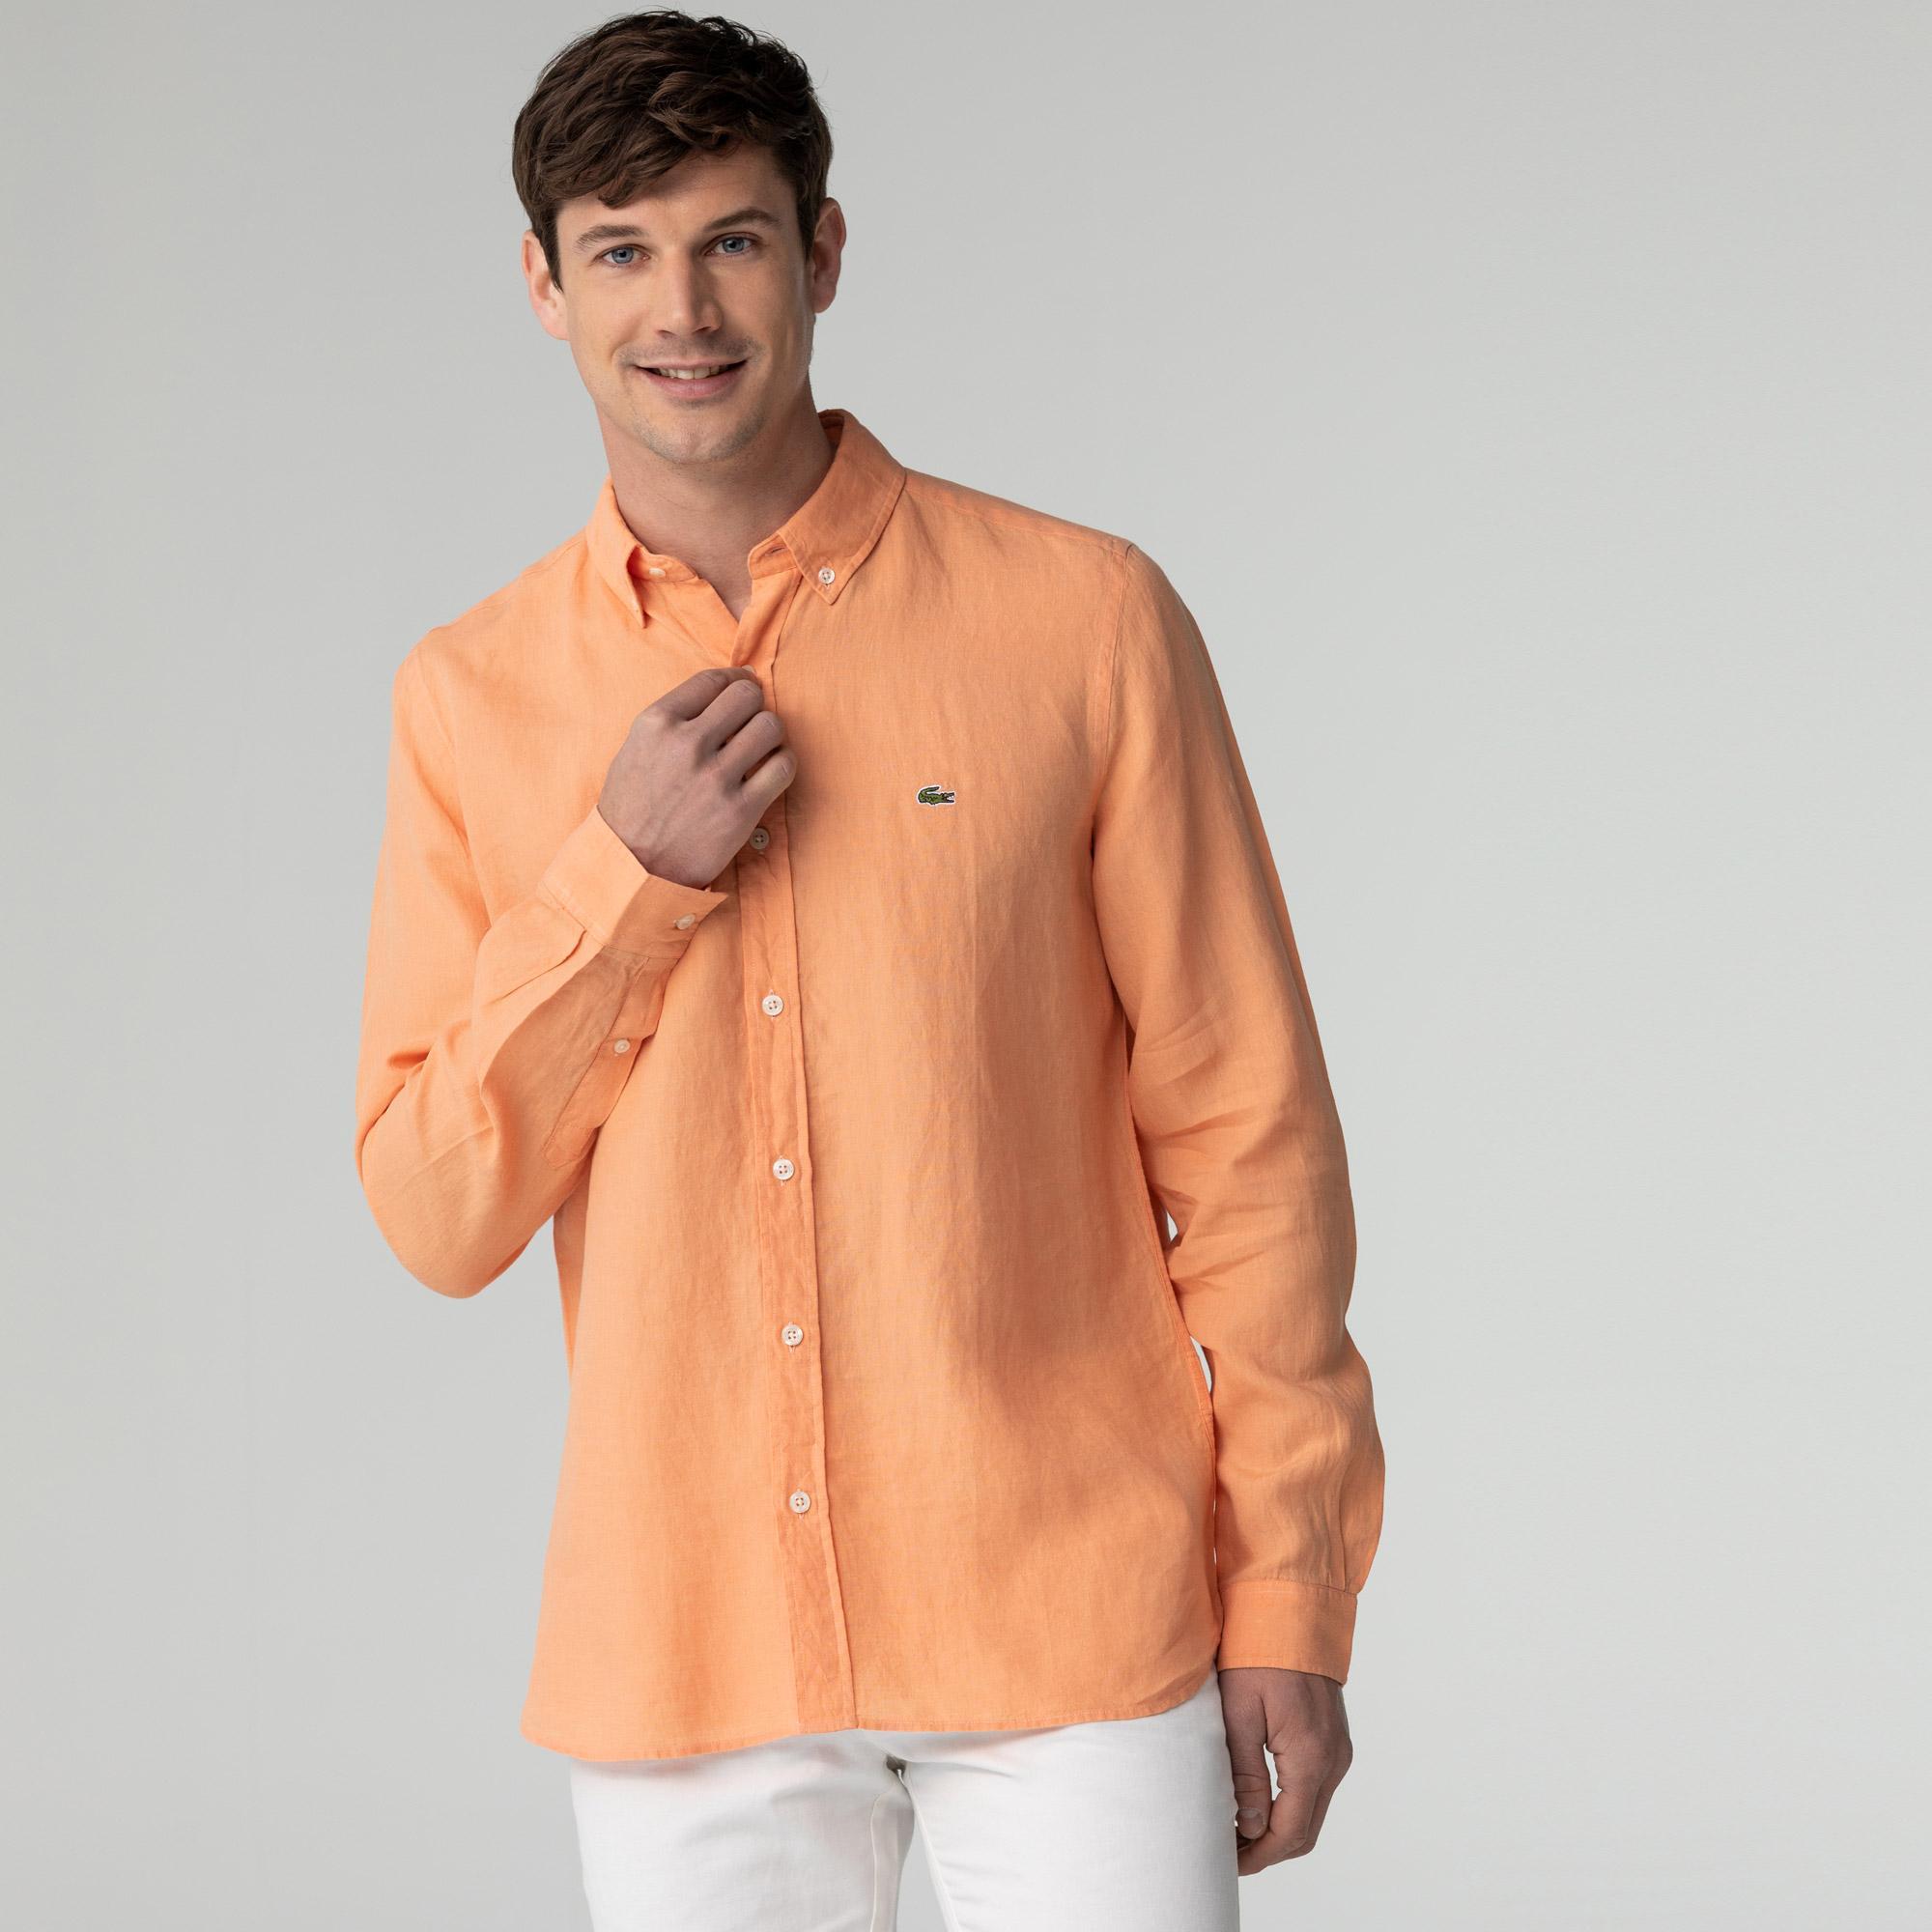 Lacoste Erkek Slim Fit Turuncu Gömlek